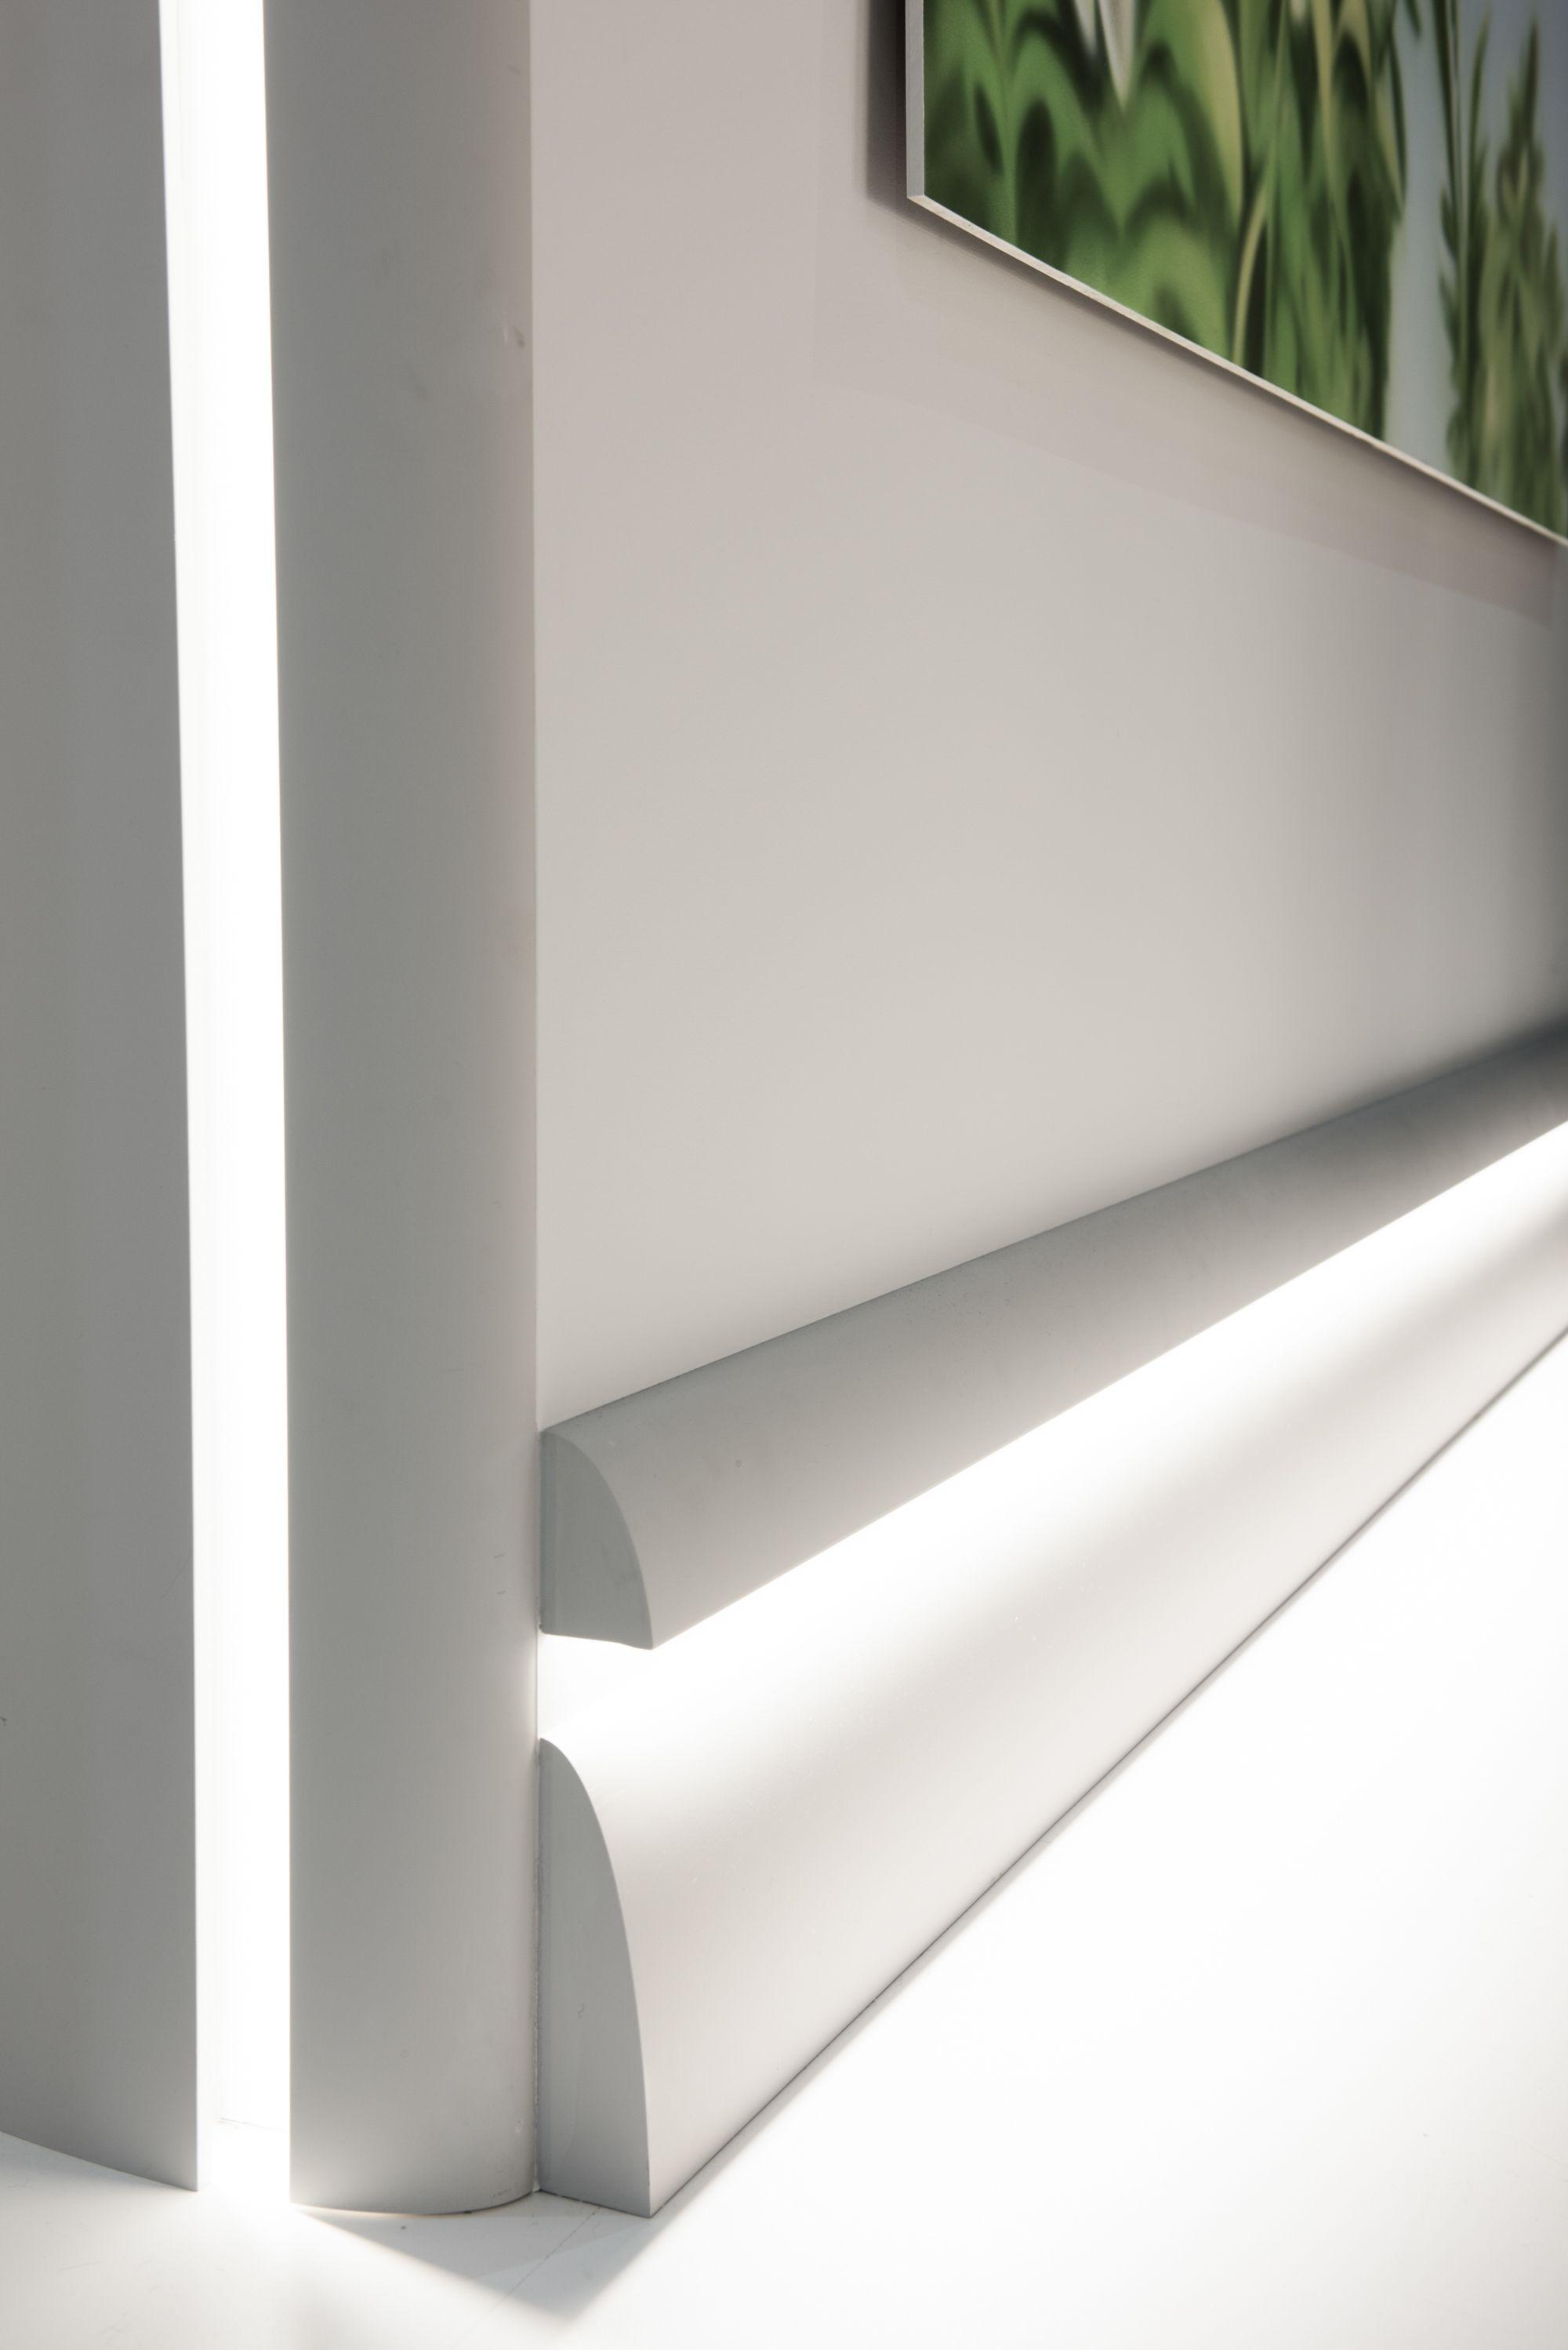 indirect lighting design. Ulf Moritz LUXXUS Cornice Moulding Indirect Lighting System Orac Decor Antonio S Ceiling Coving Decoration 2 M \u2013 Bild 5 Design O